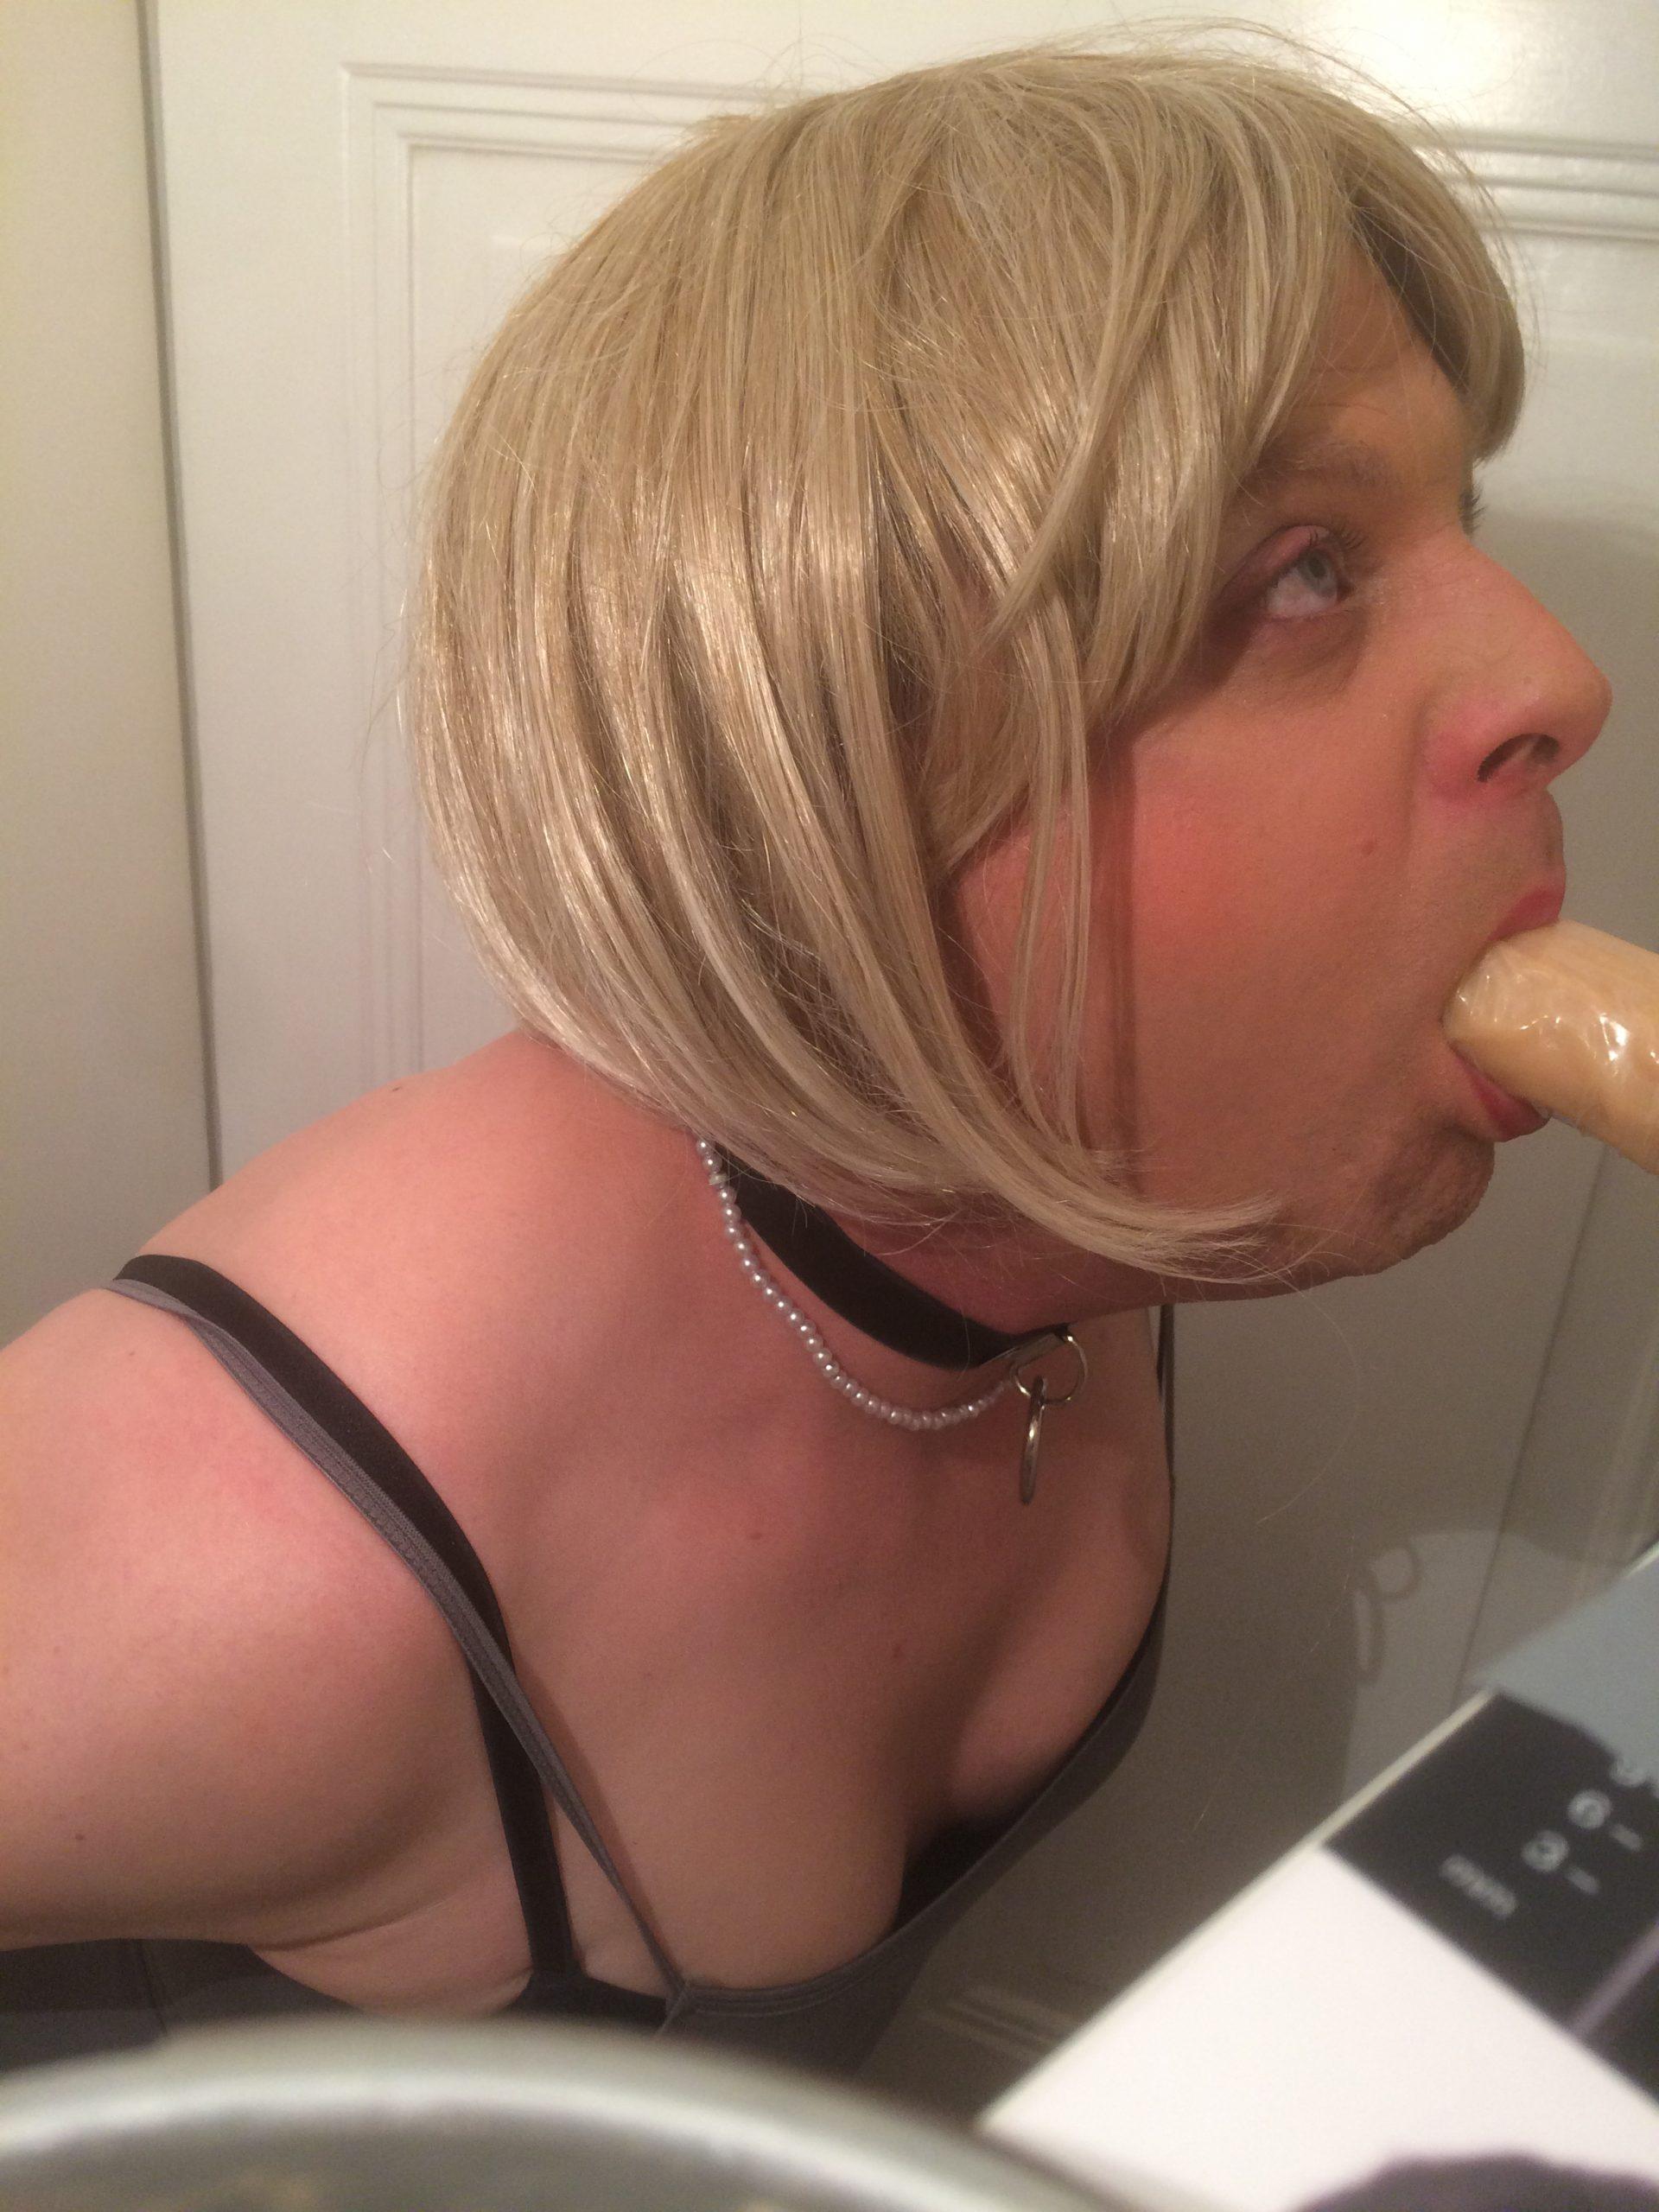 Sissy-Slut-Dana-4